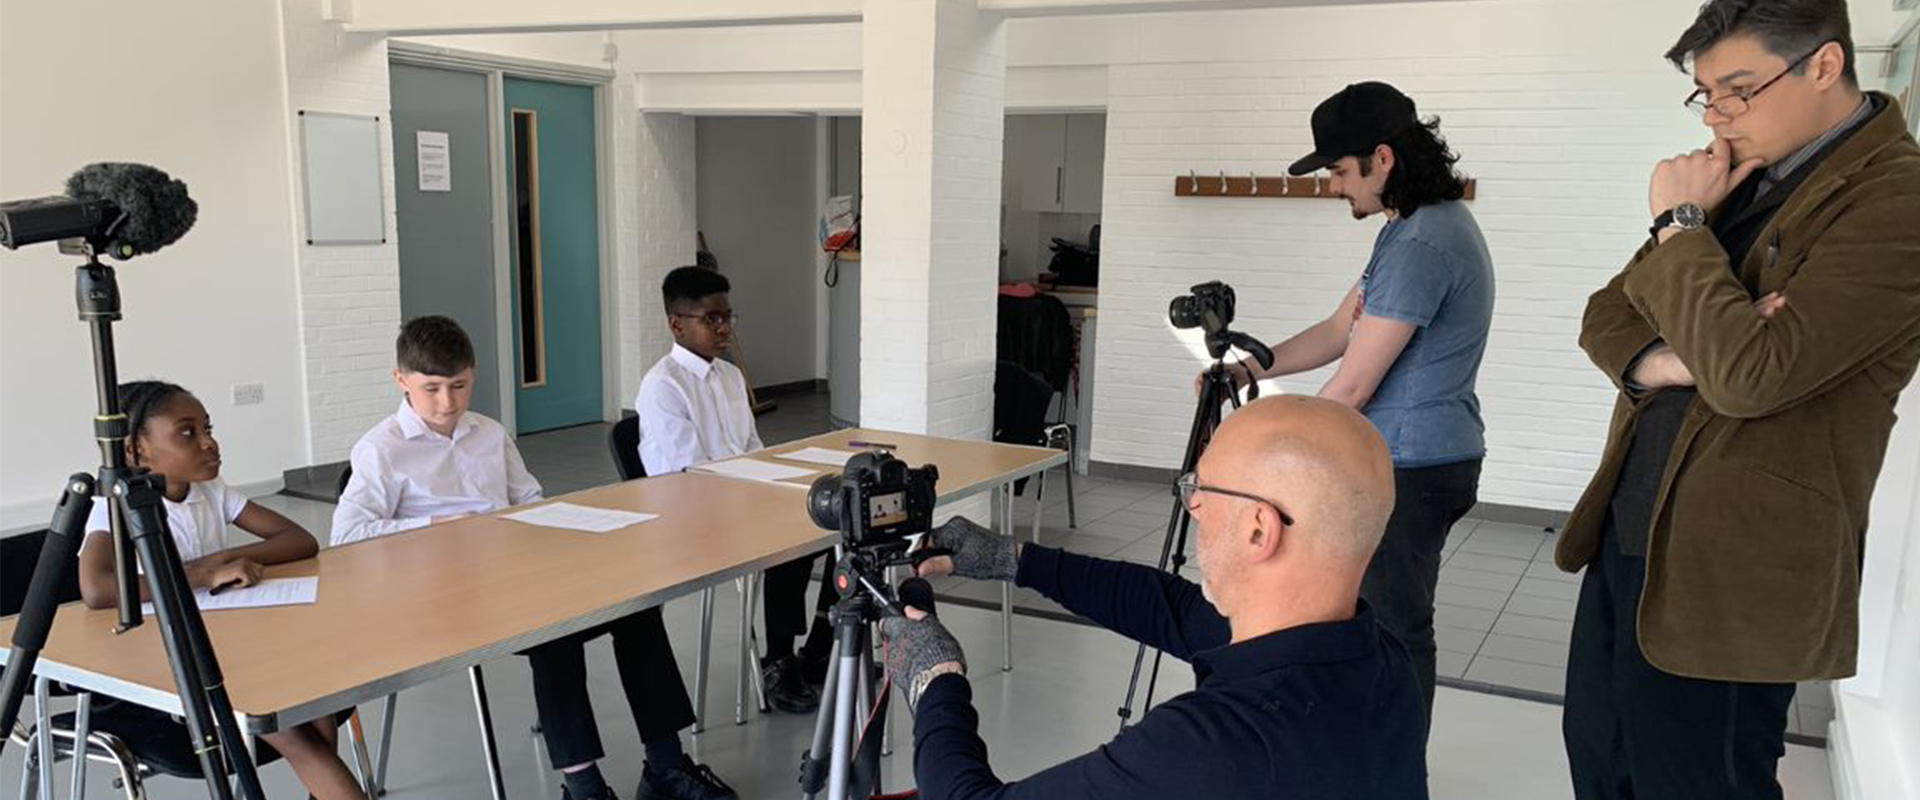 schoolchildren taking part in filming project